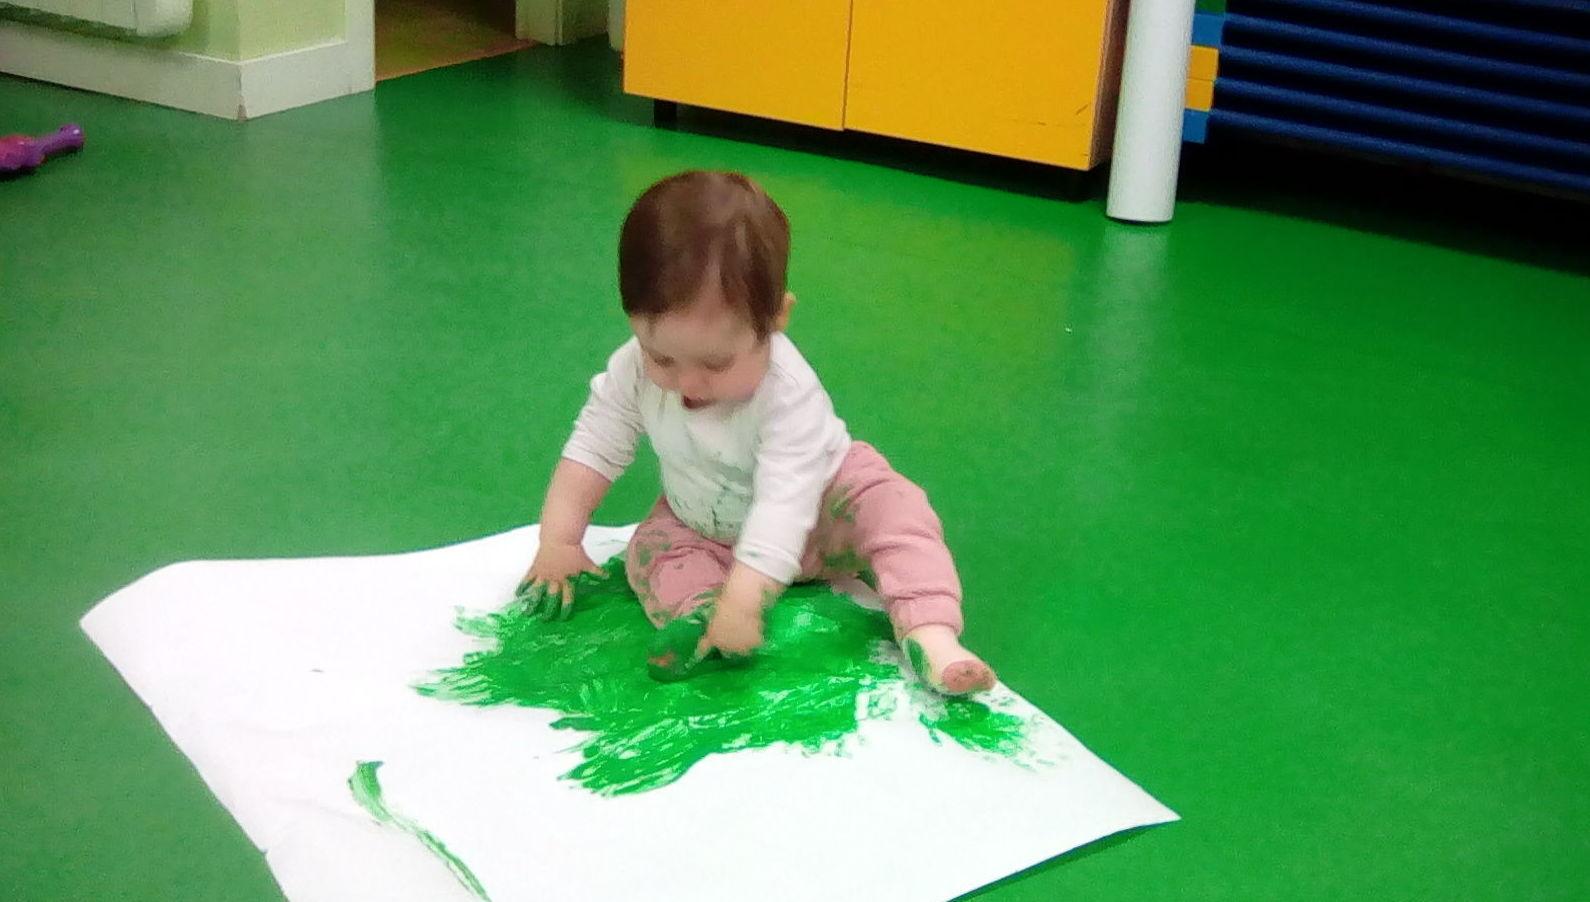 Foto 32 de Escuela infantil en Algete | E.I. Cuatro Pecas de Colores